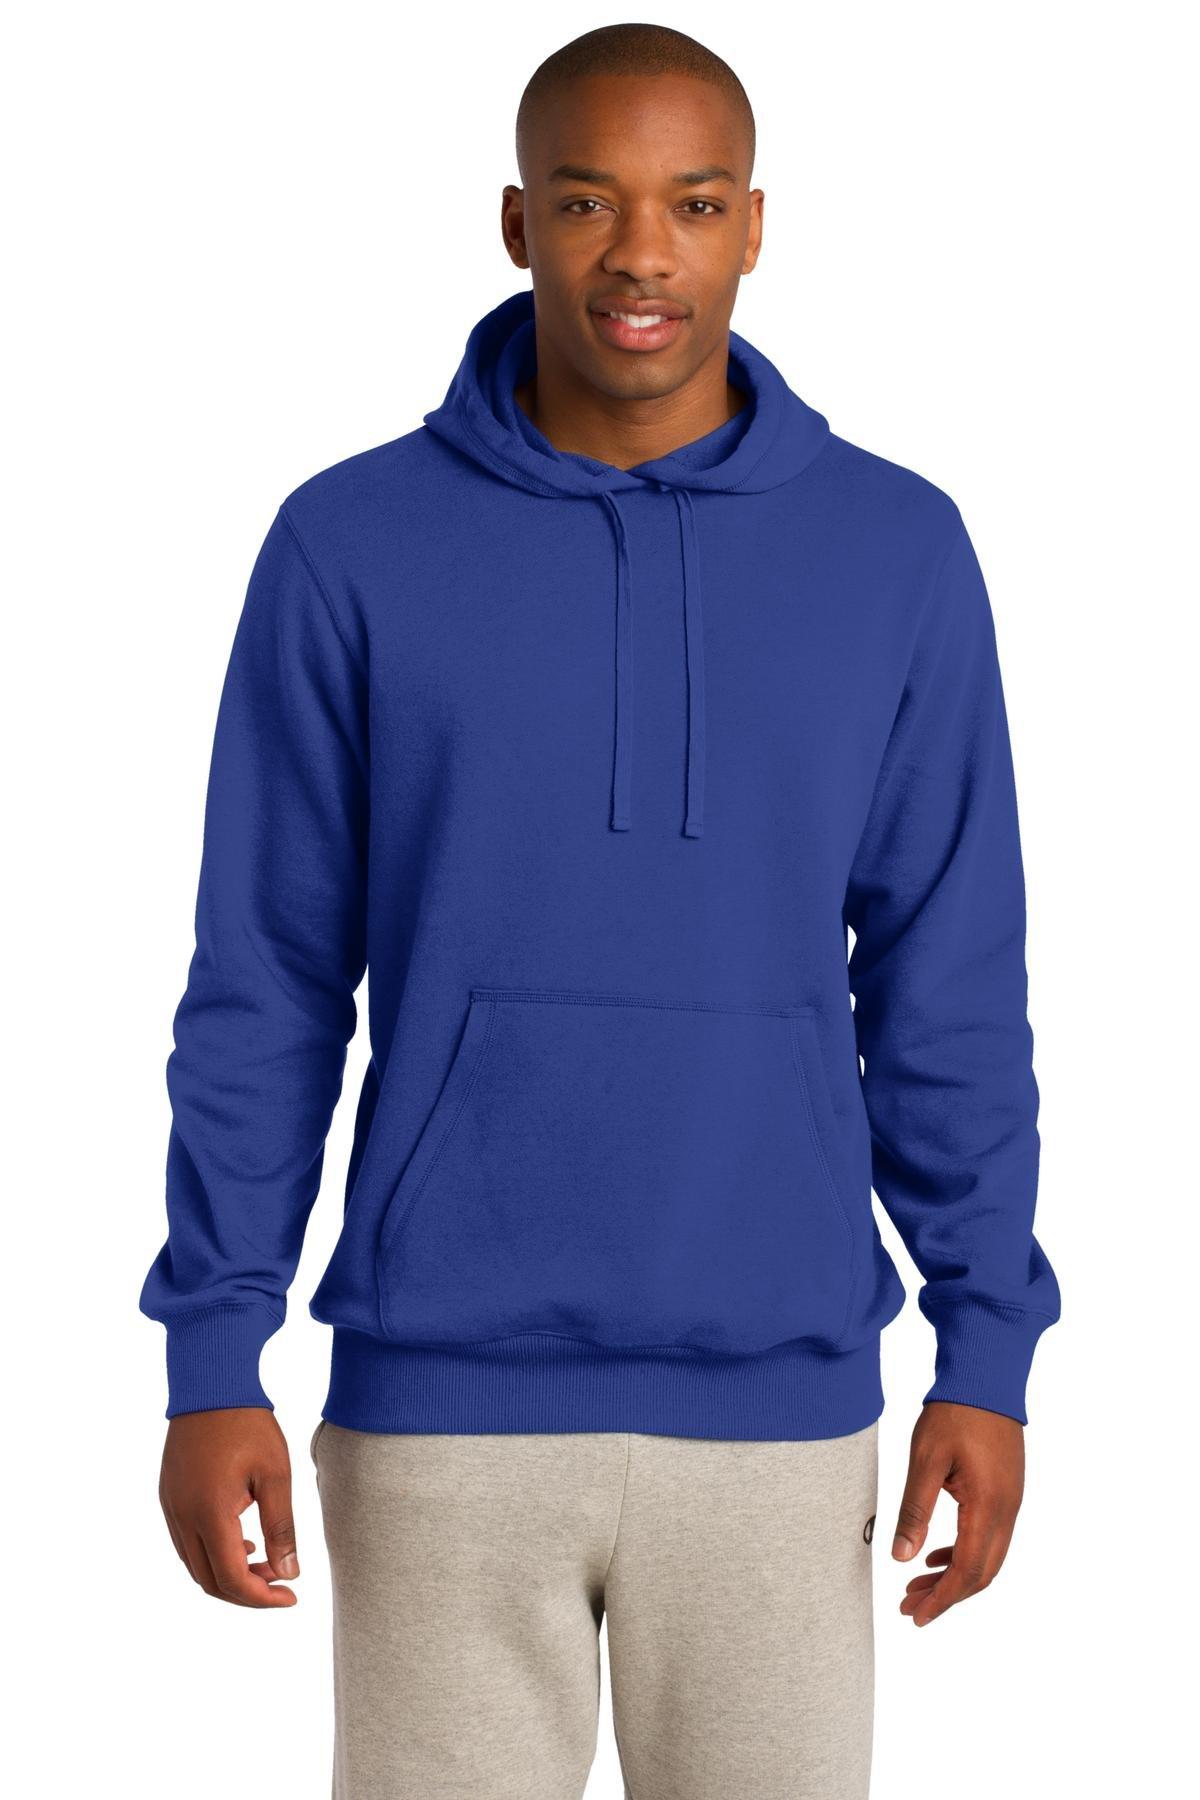 Sport-Tek Men's Tall Pullover Hooded Sweatshirt 4XLT True Royal by Sport-Tek